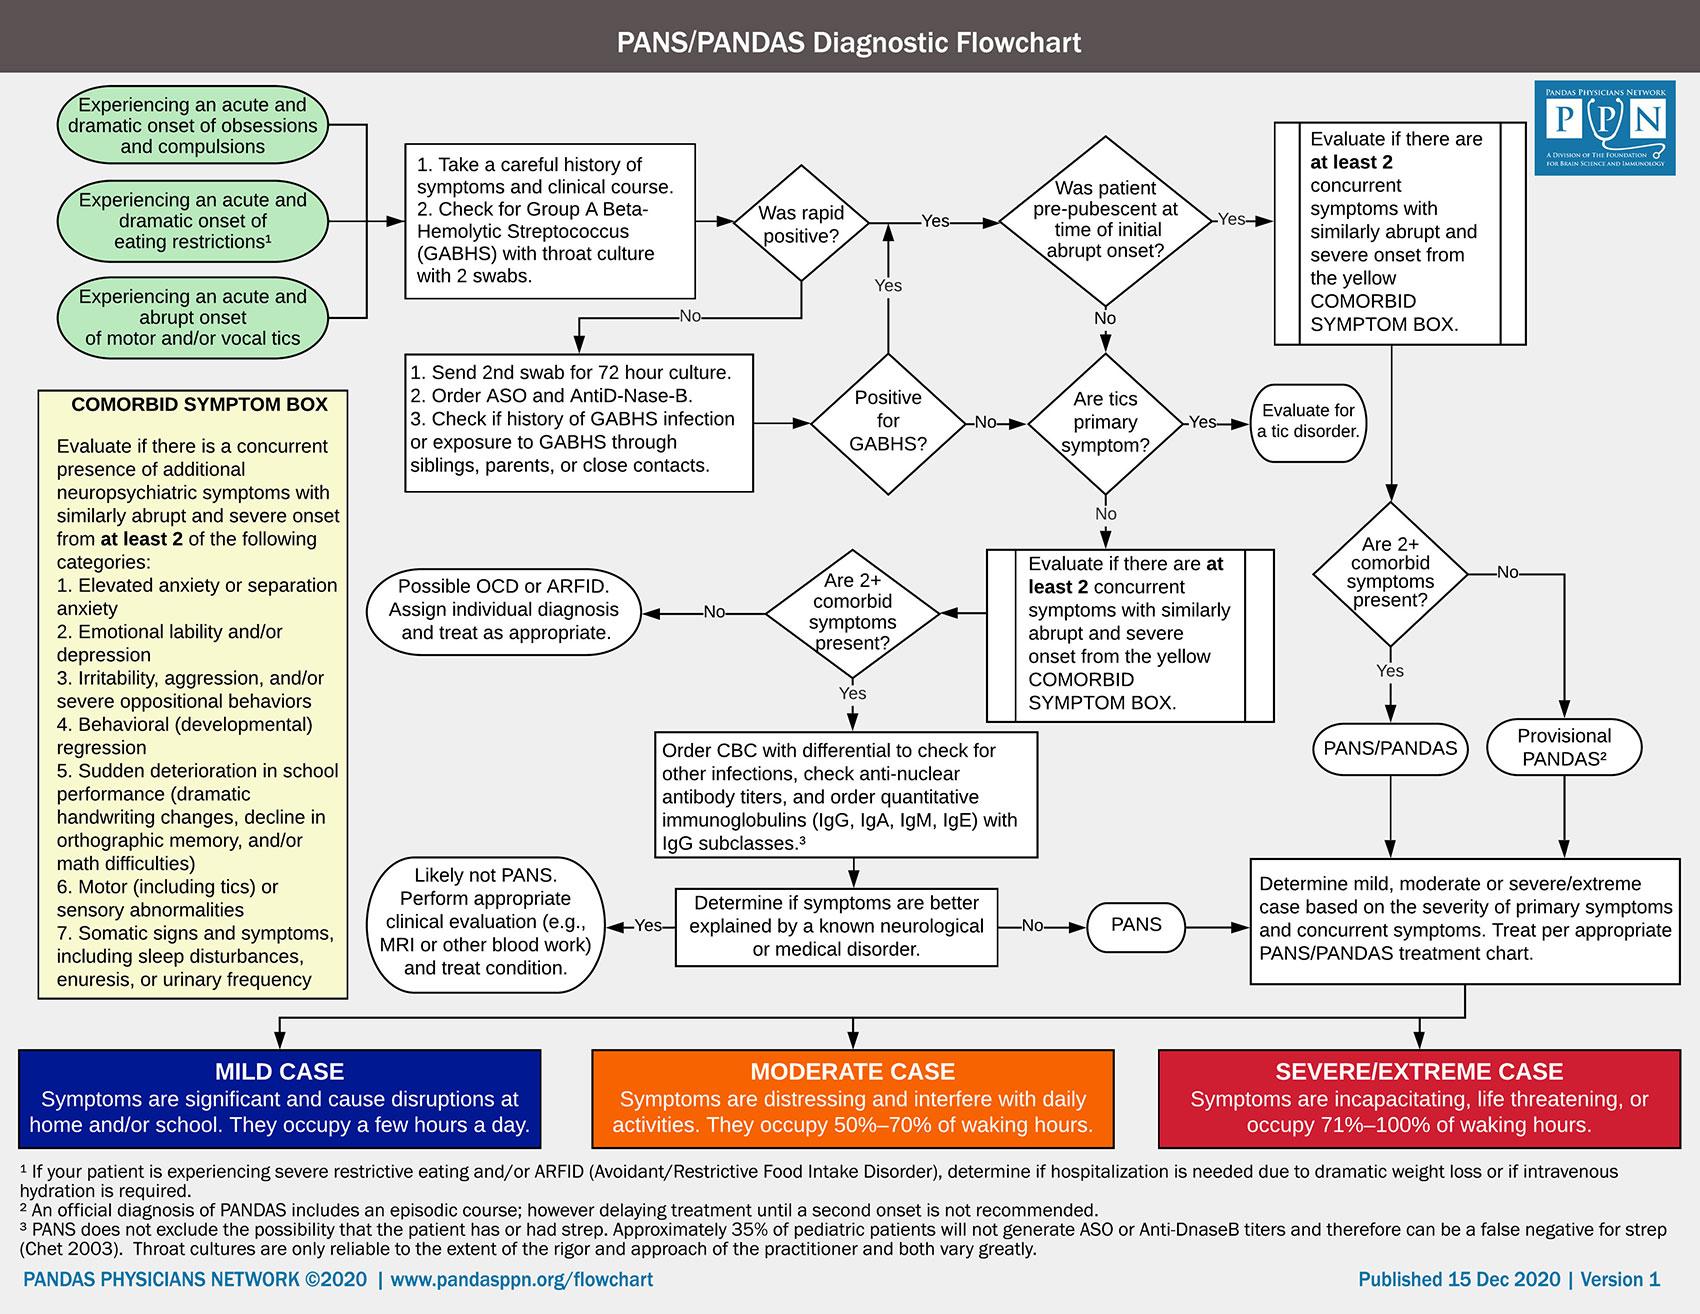 How to diagnose PANS/PANDAS